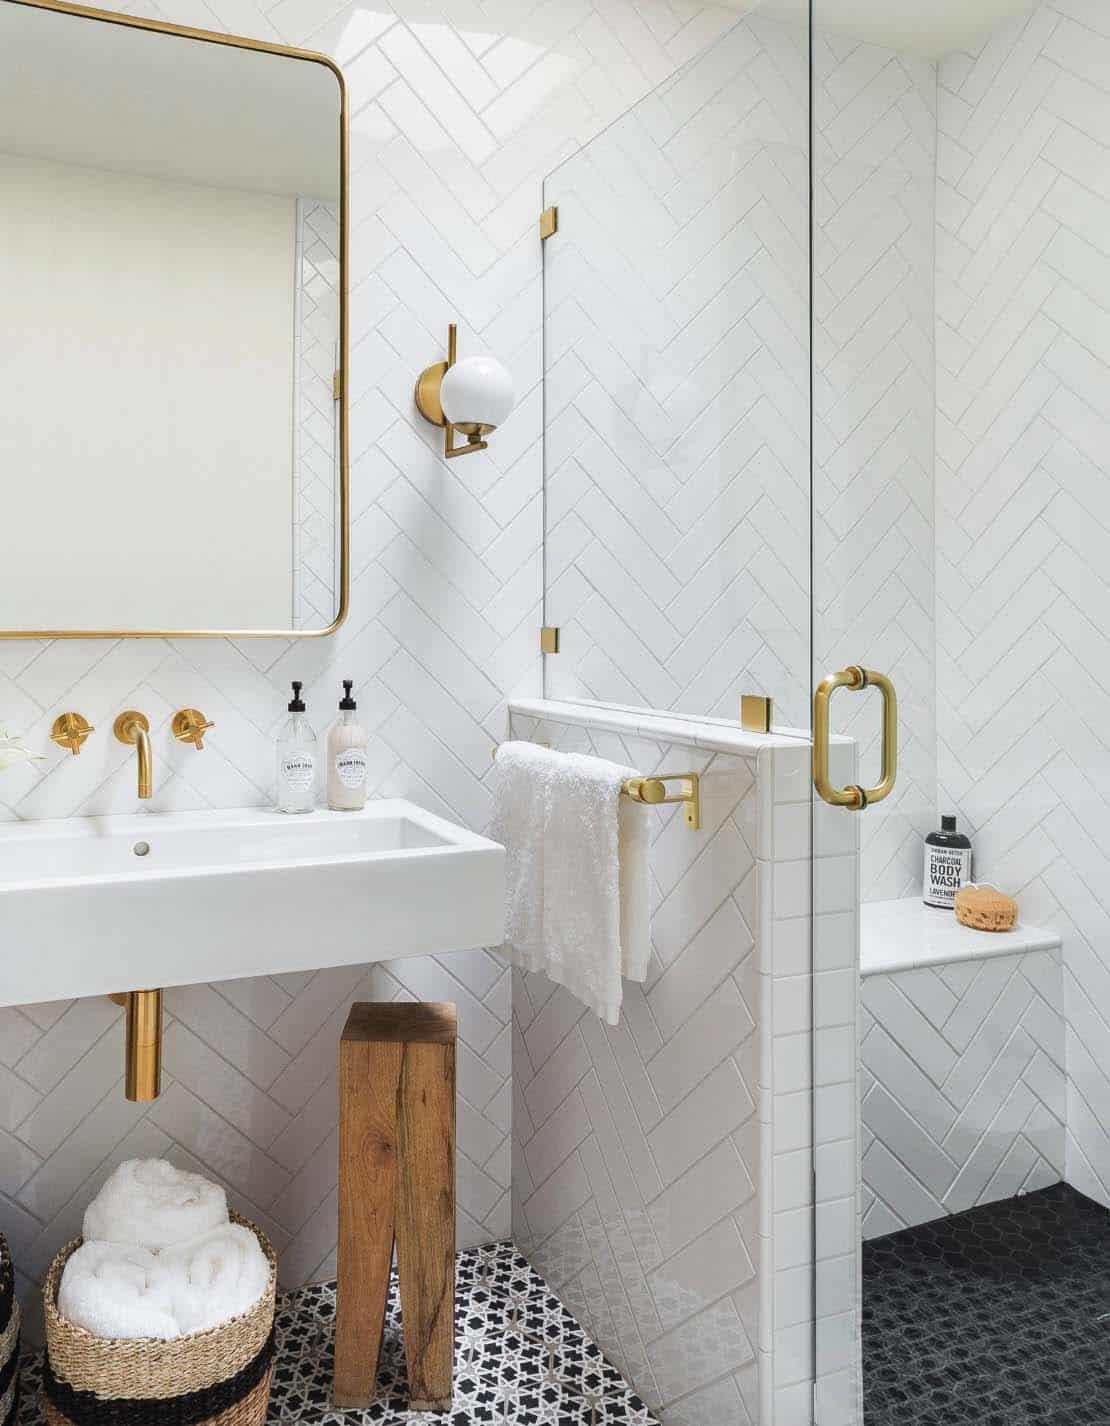 Modern Eclectic Bathroom | All White Bathroom | White Subway Tile Chevron Pattern Walls